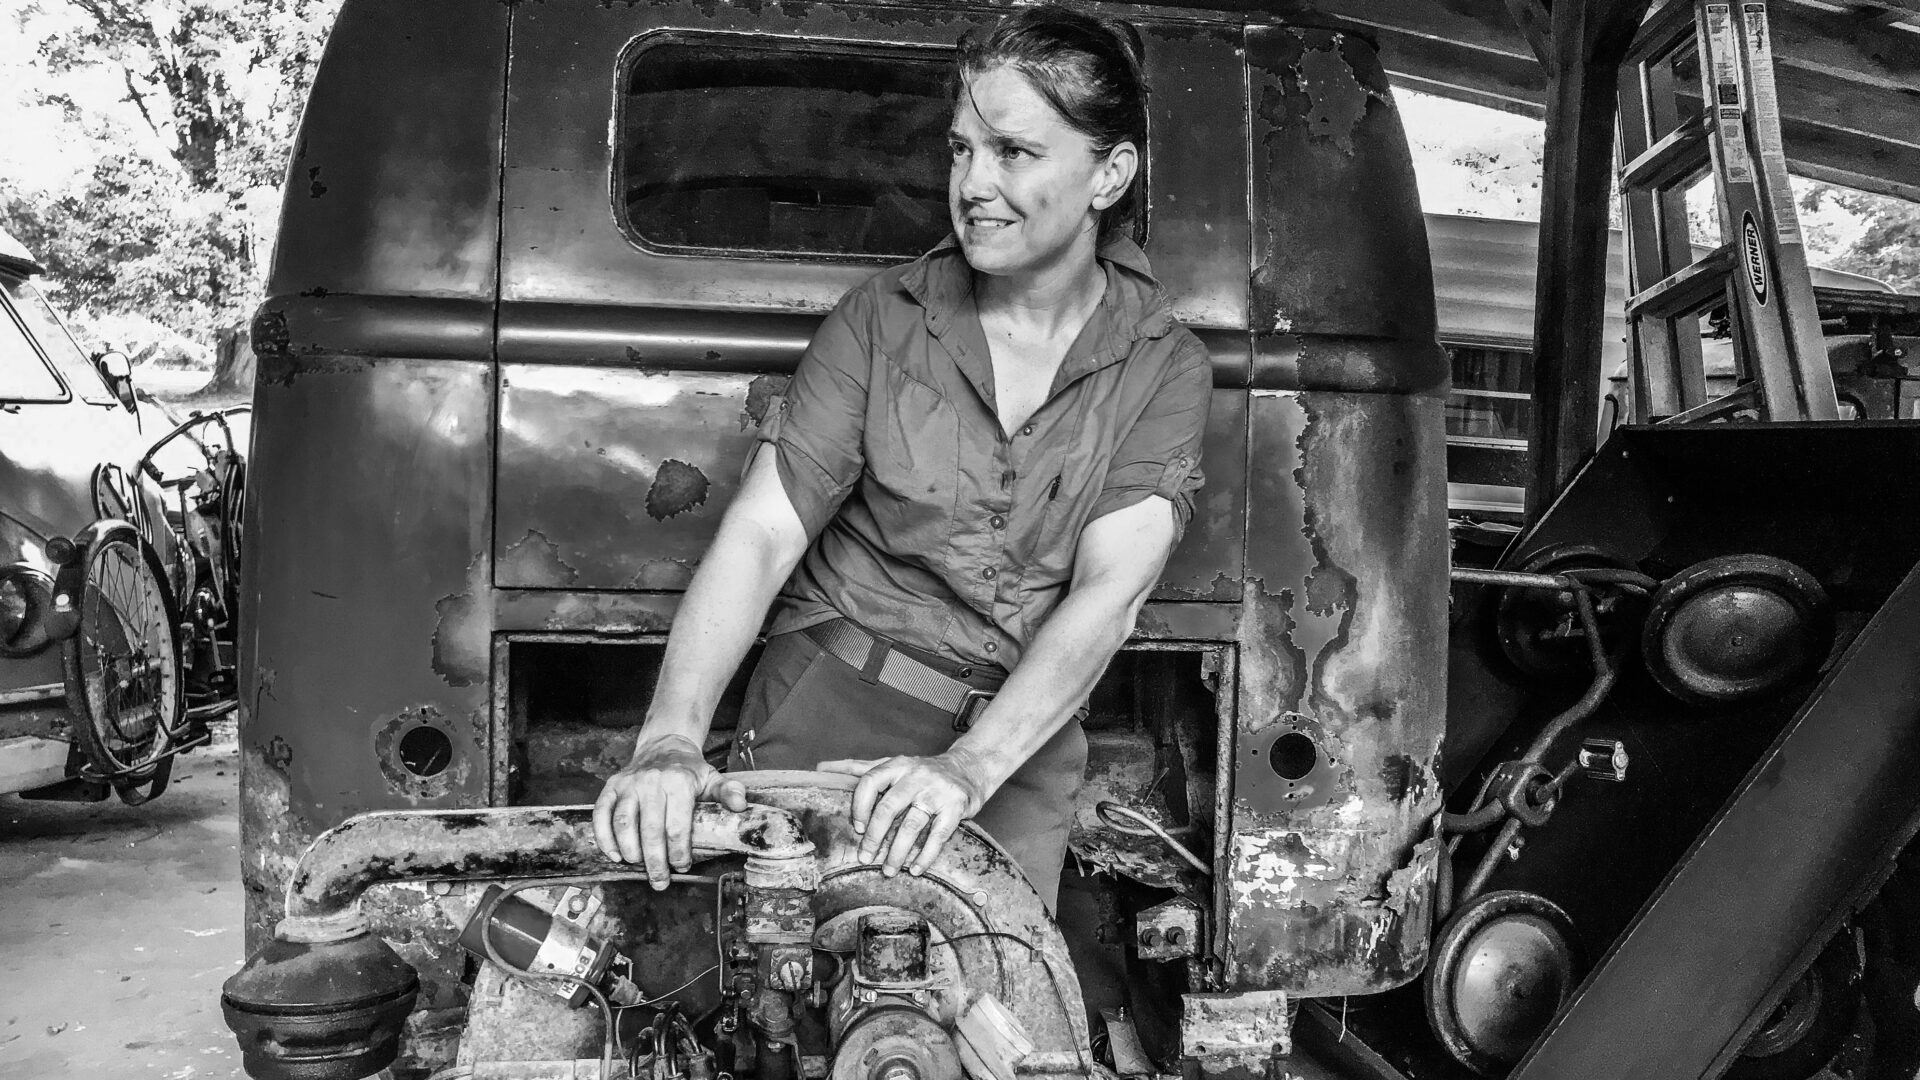 Junk In This Truck - Marci Wease - Metal Artist